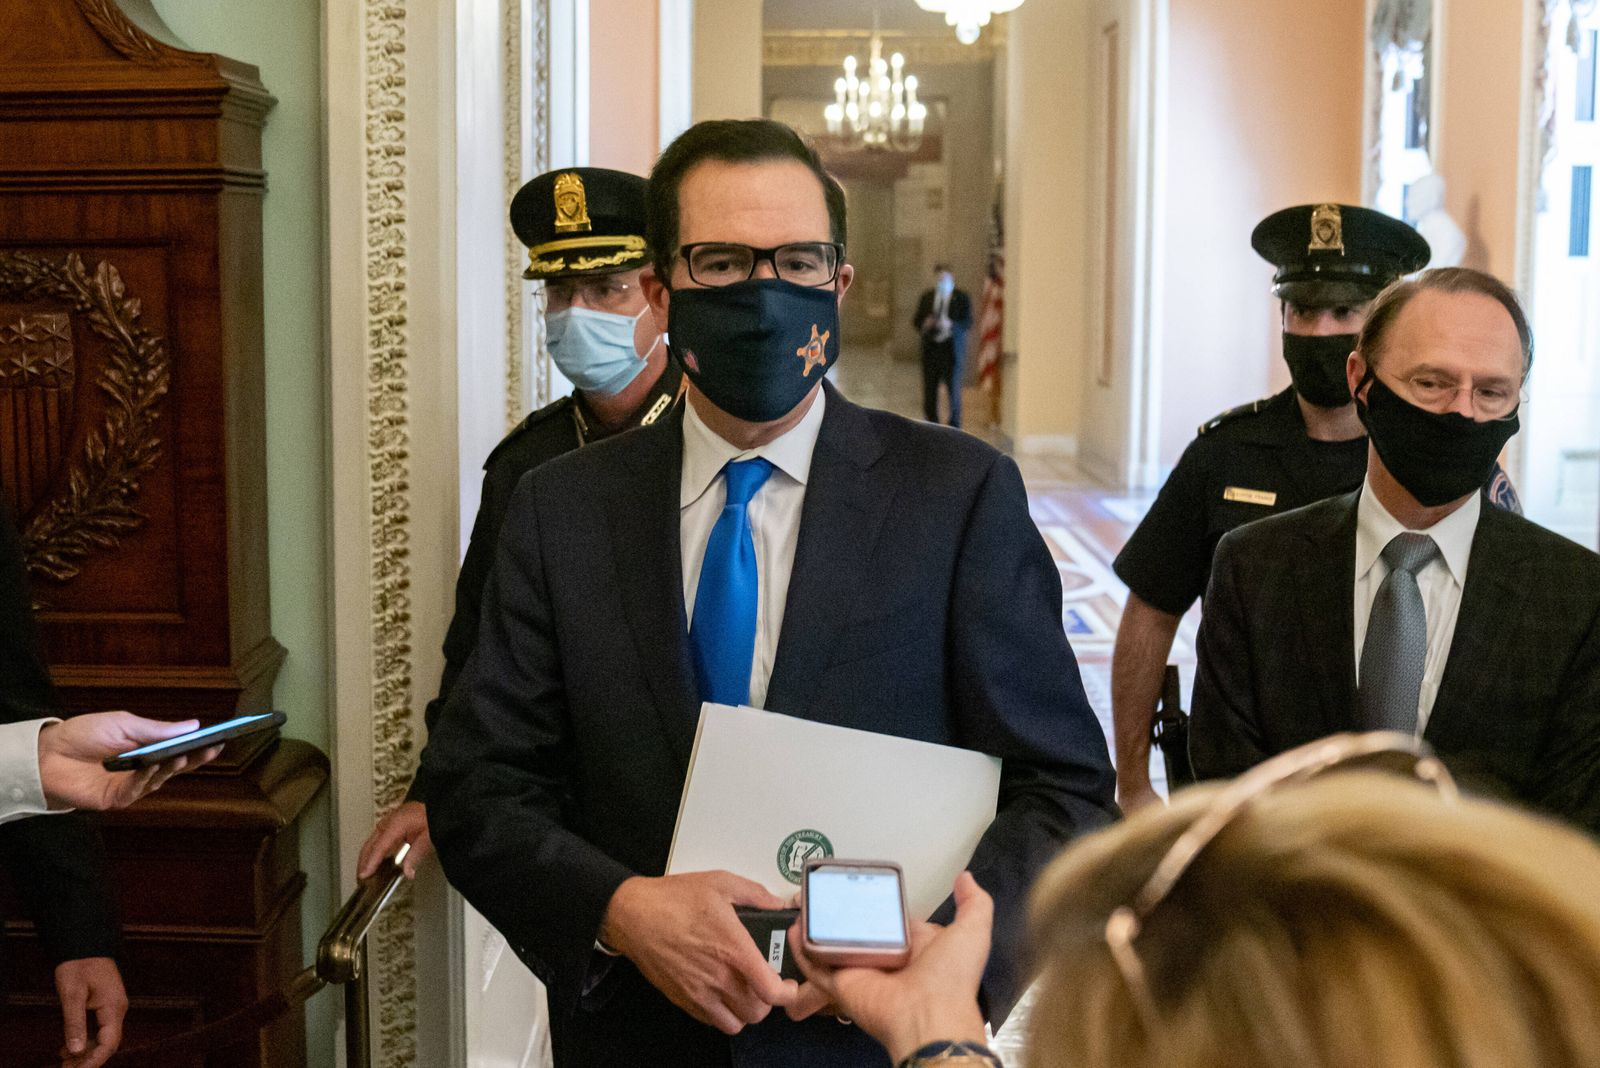 U.S. Treasury Secretary Steven Mnuchin walks from the office of Senate Majority Leader Mitch McConnell (R-KY) at the U.